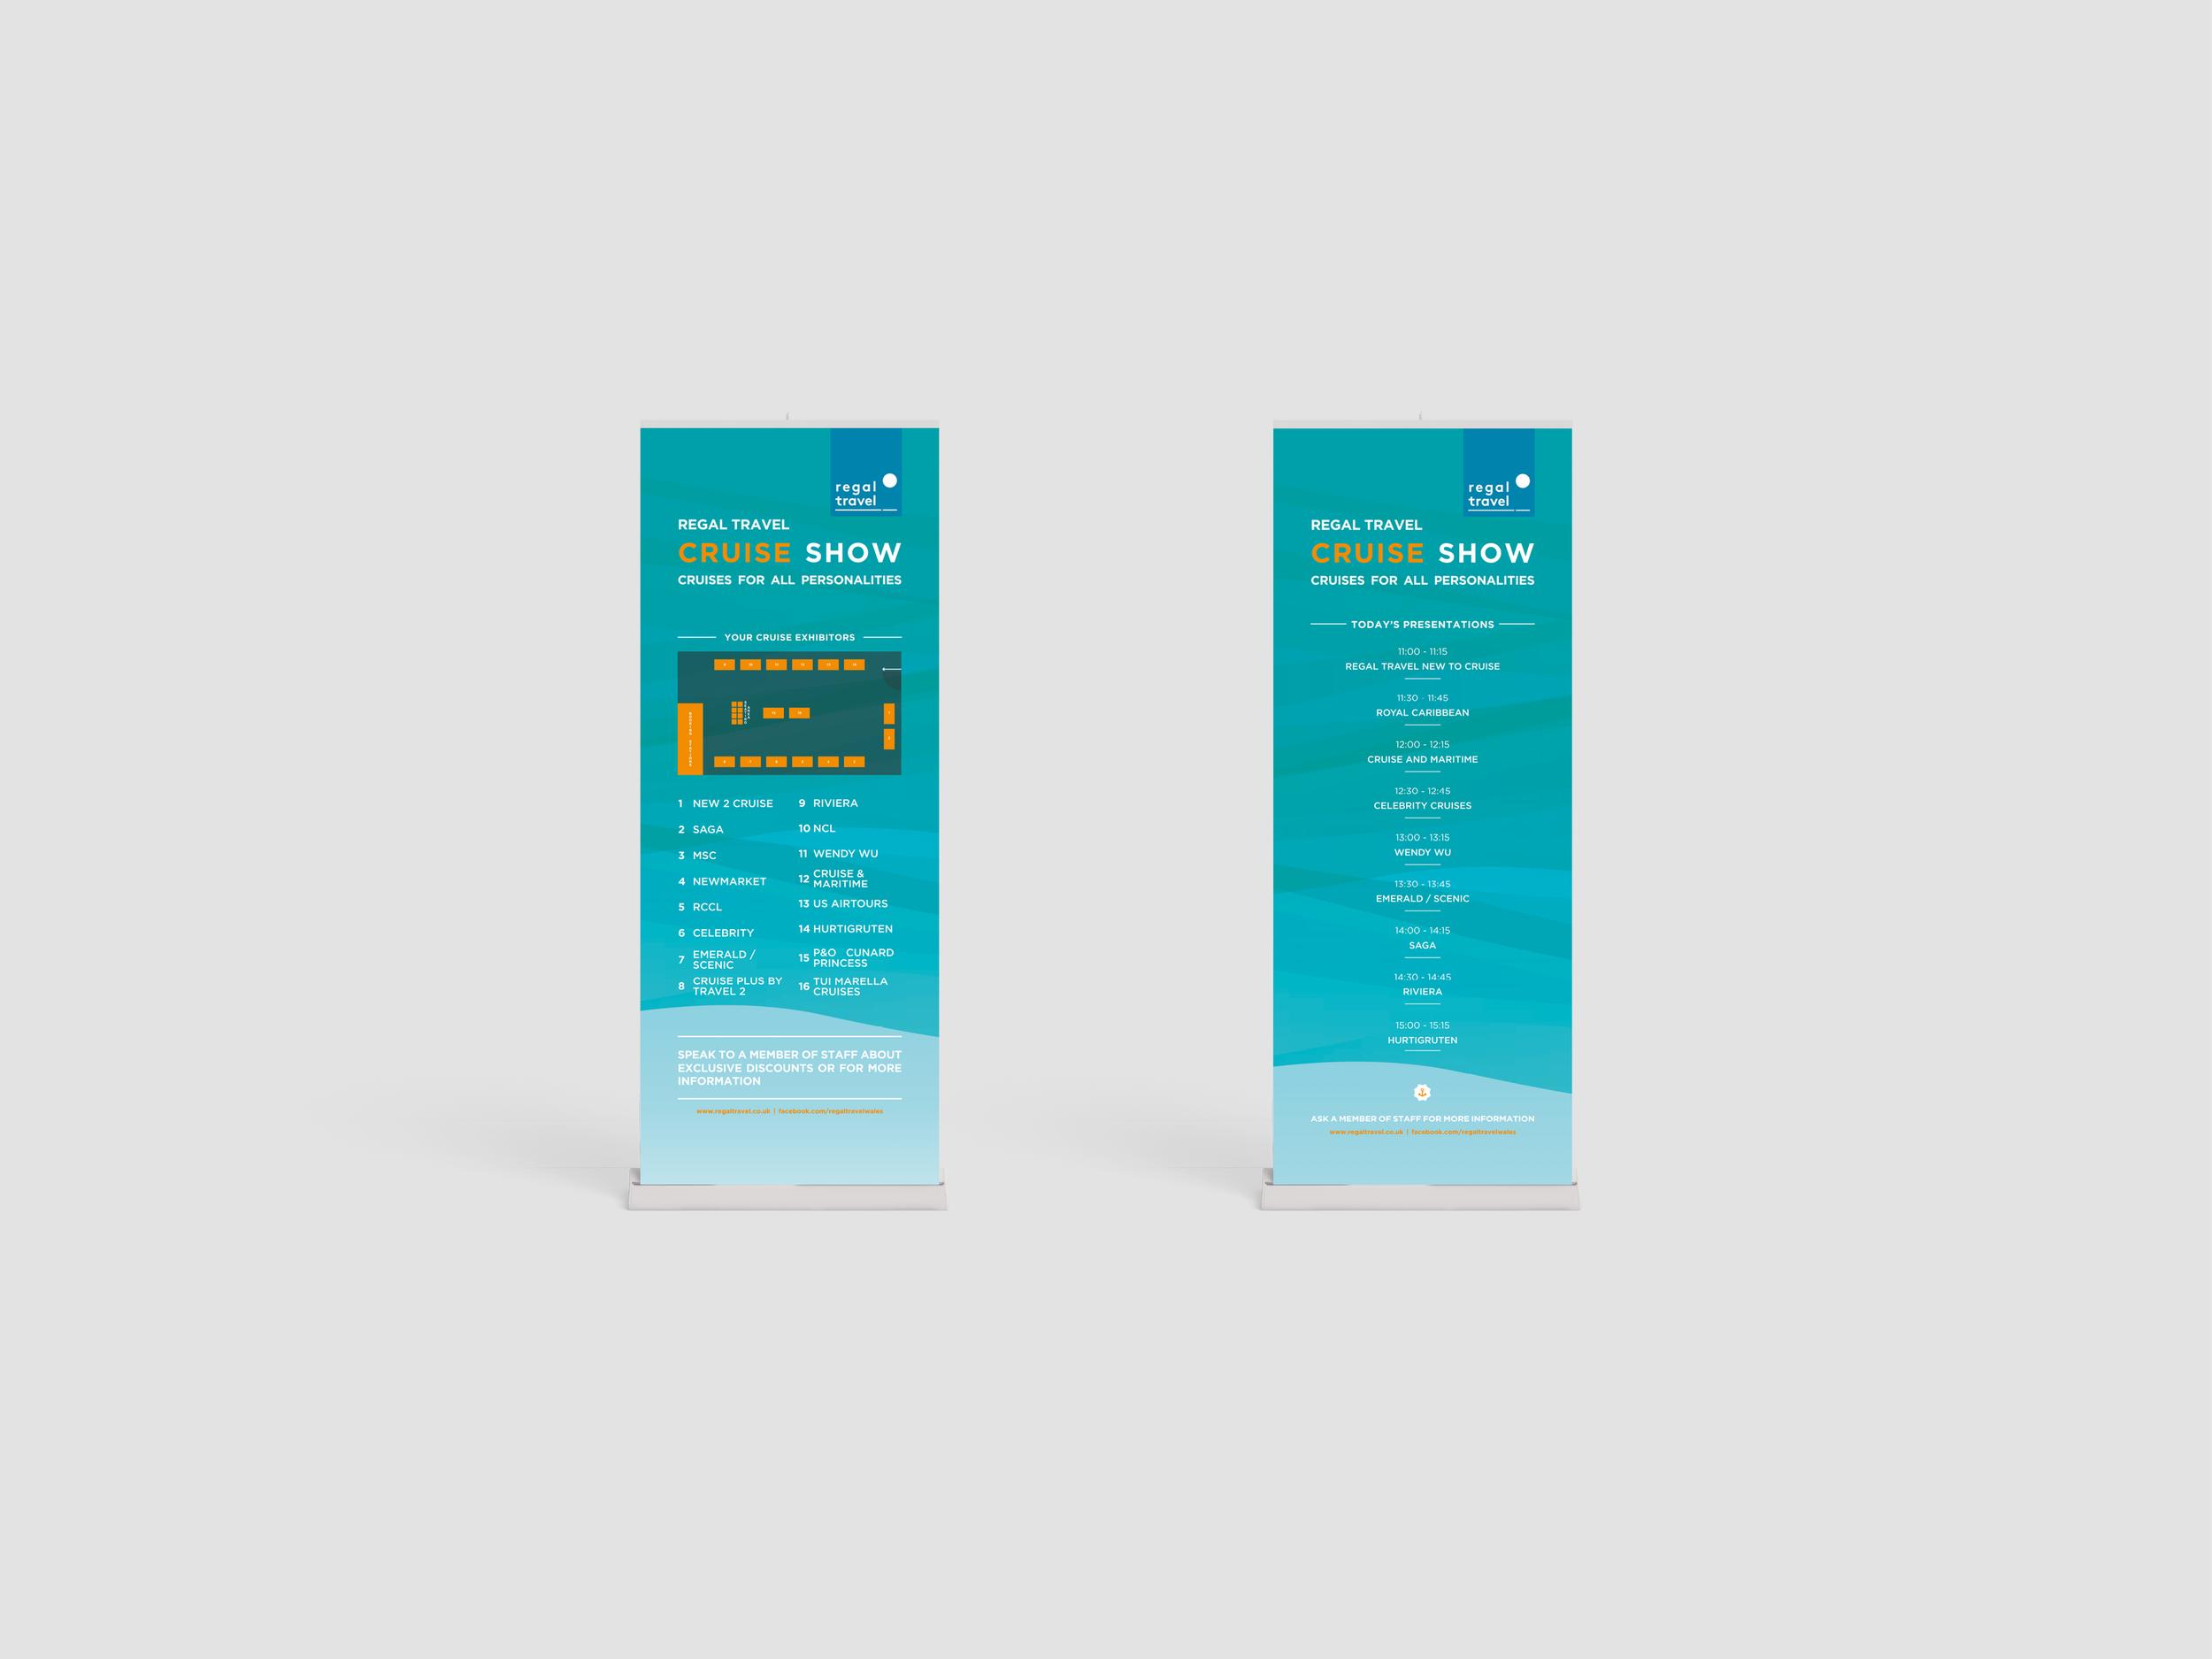 travel marketing pop-up prints